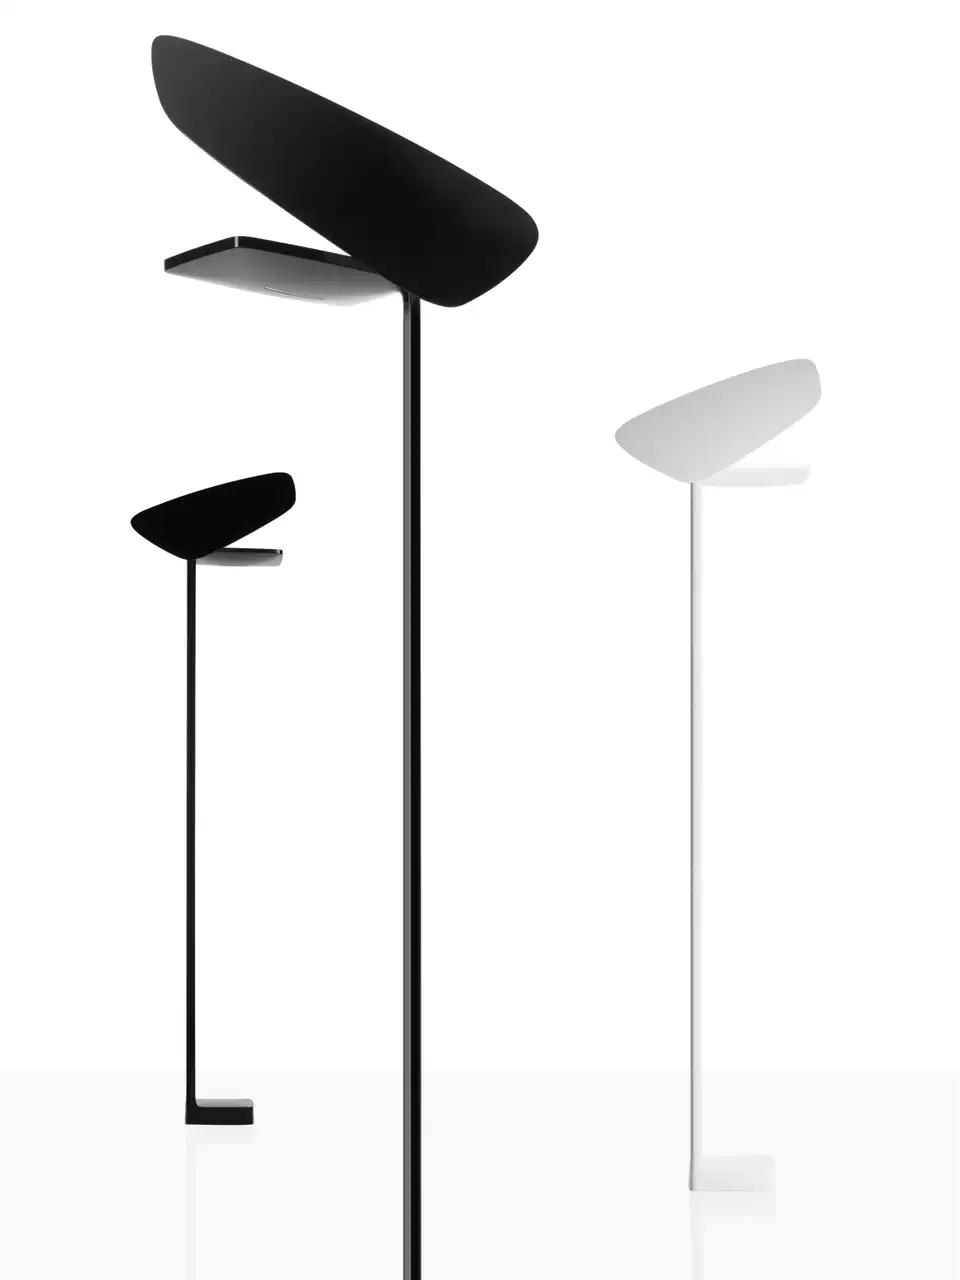 Foscarini Lightwing Floor Lamp In Black By Jean Marie Massaud In 2020 Floor Lamp Lamp Foscarini